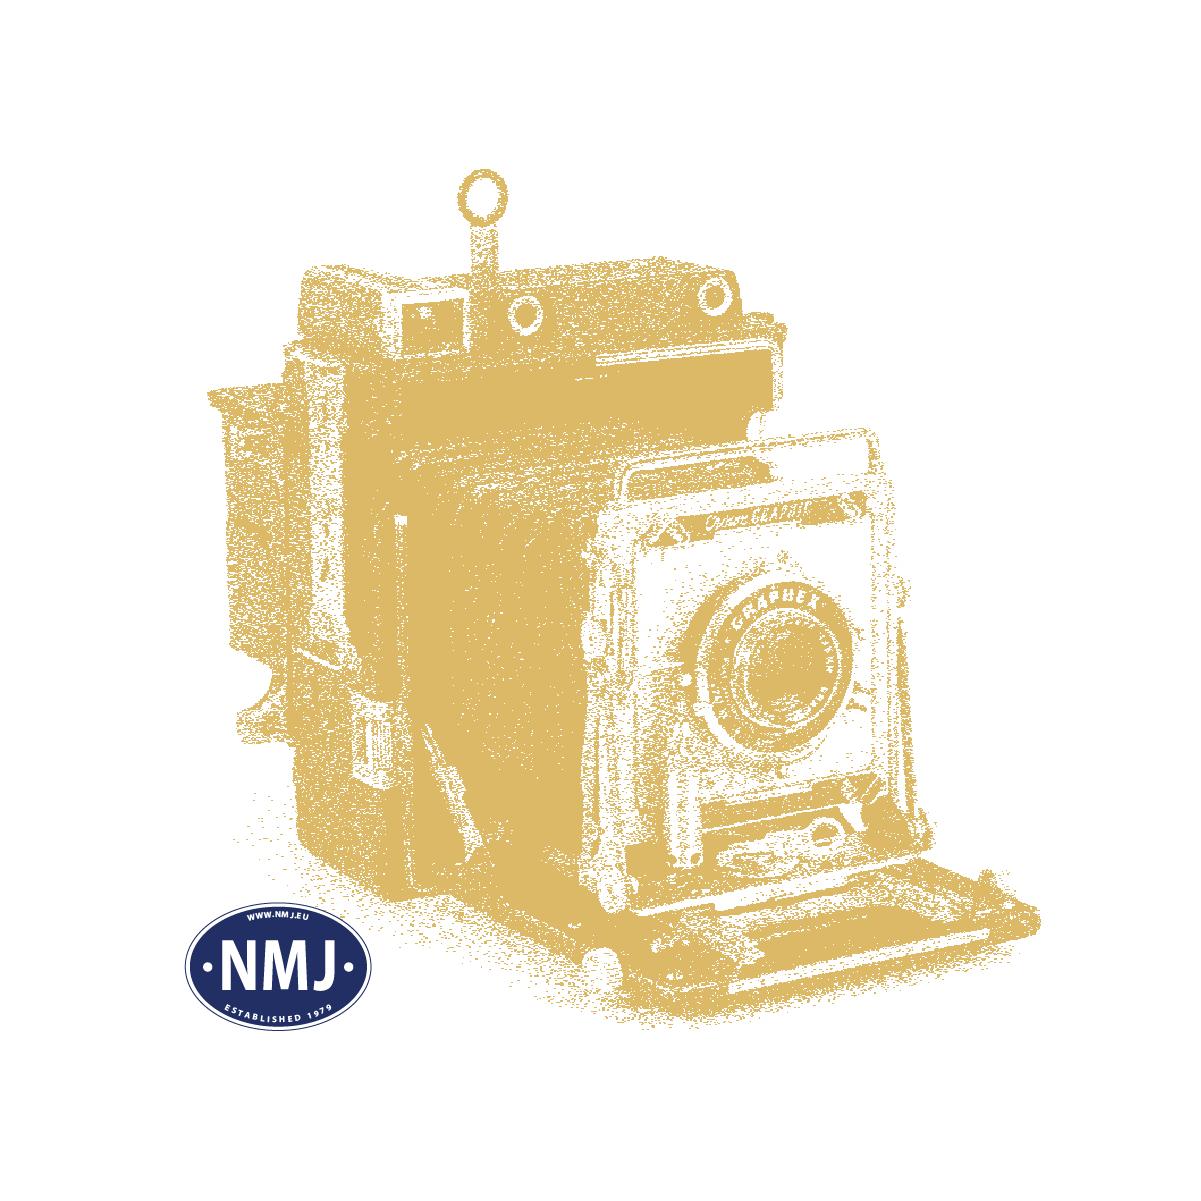 NMJT84.301AC - NMJ Topline NSB BM69A.11, AC digital